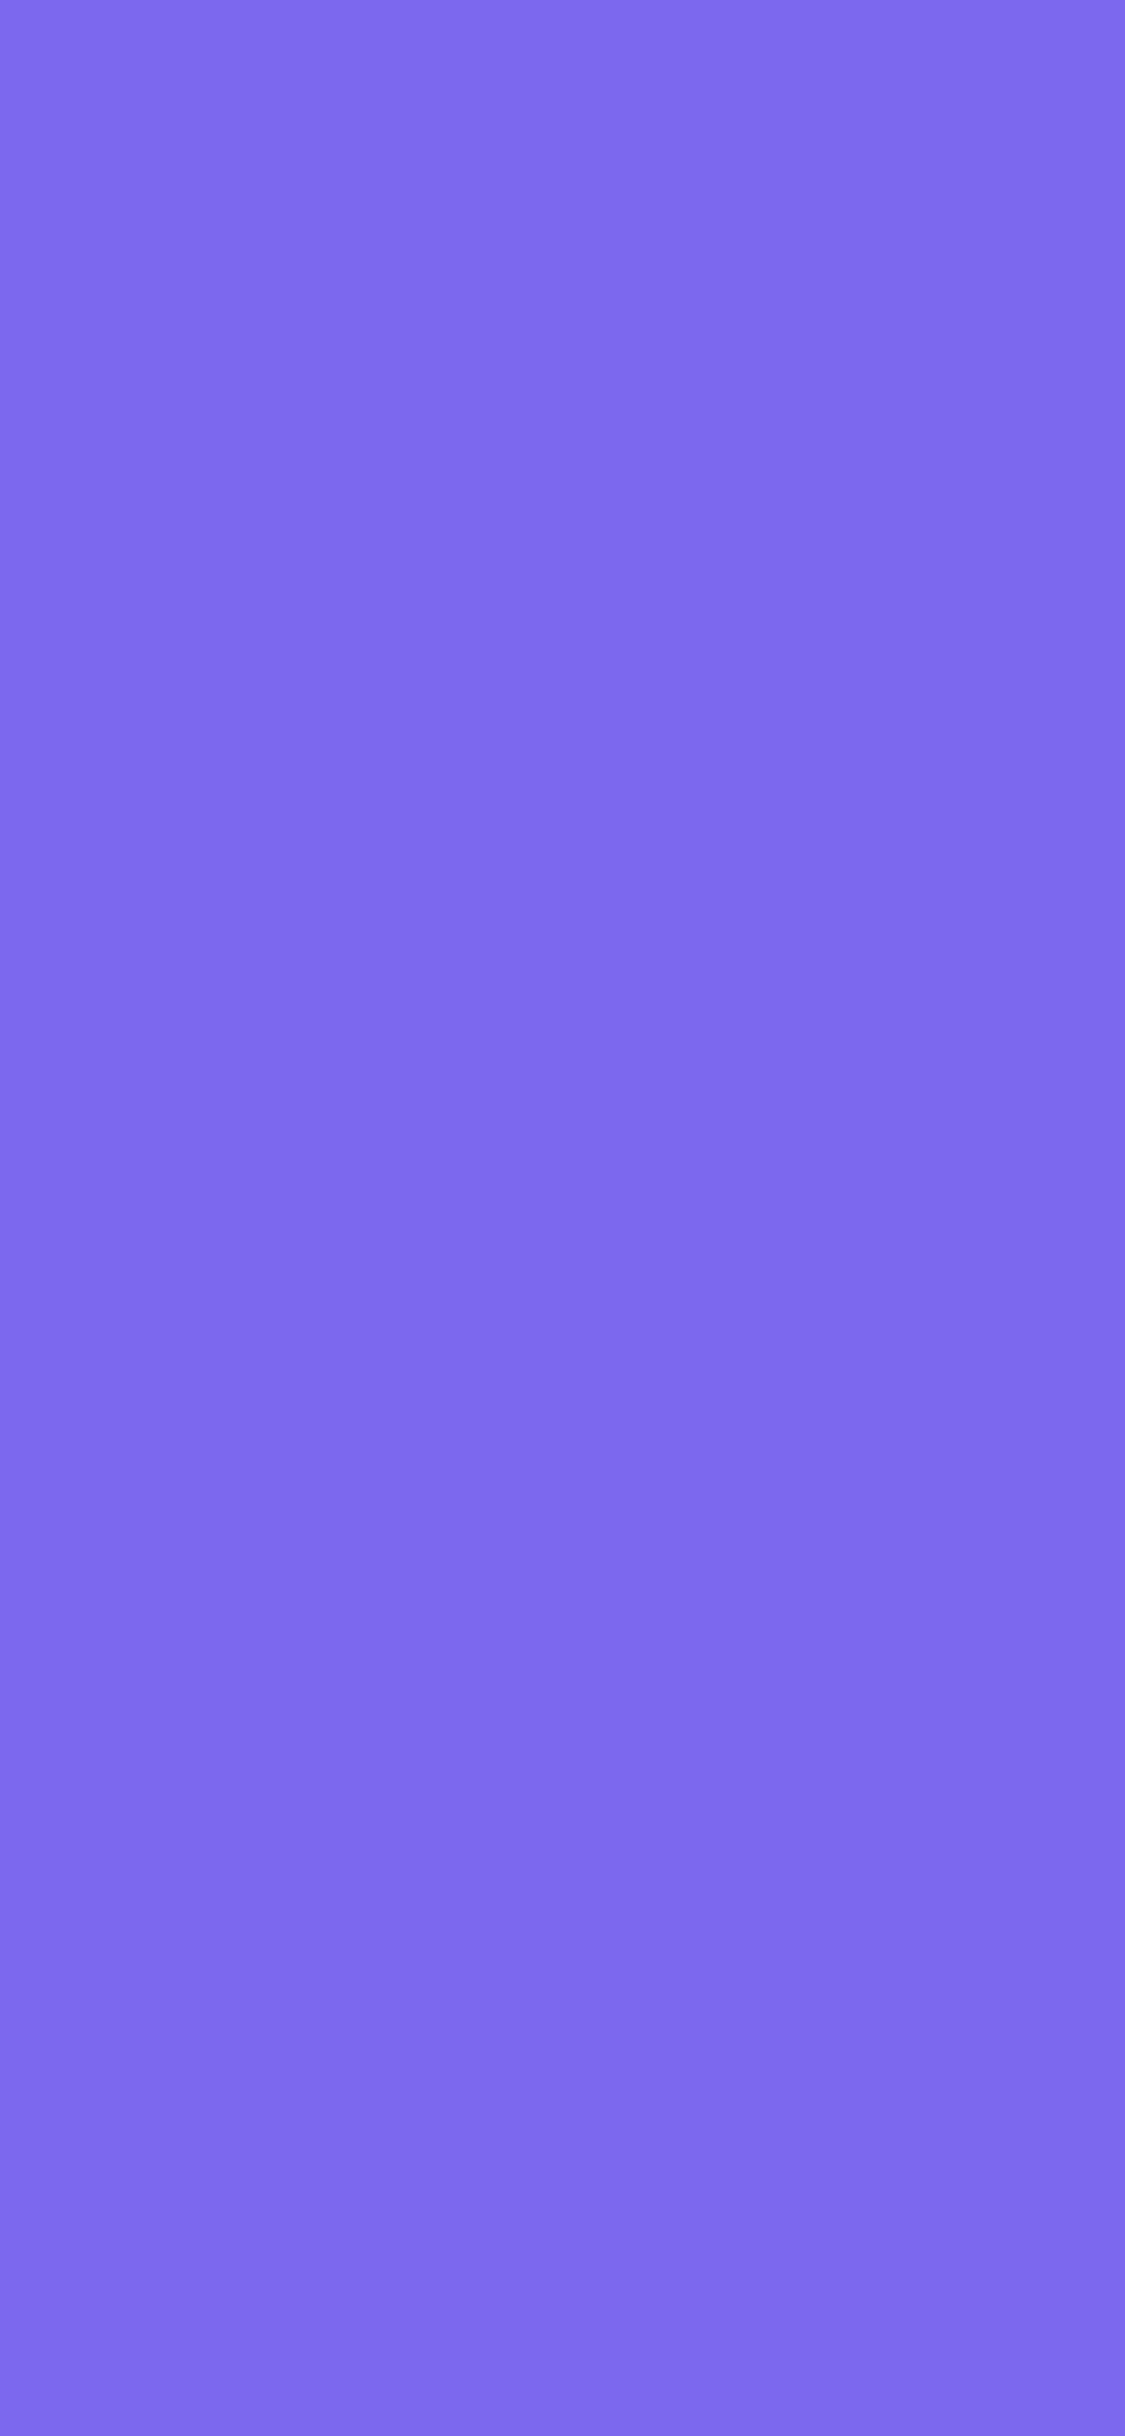 1125x2436 Medium Slate Blue Solid Color Background